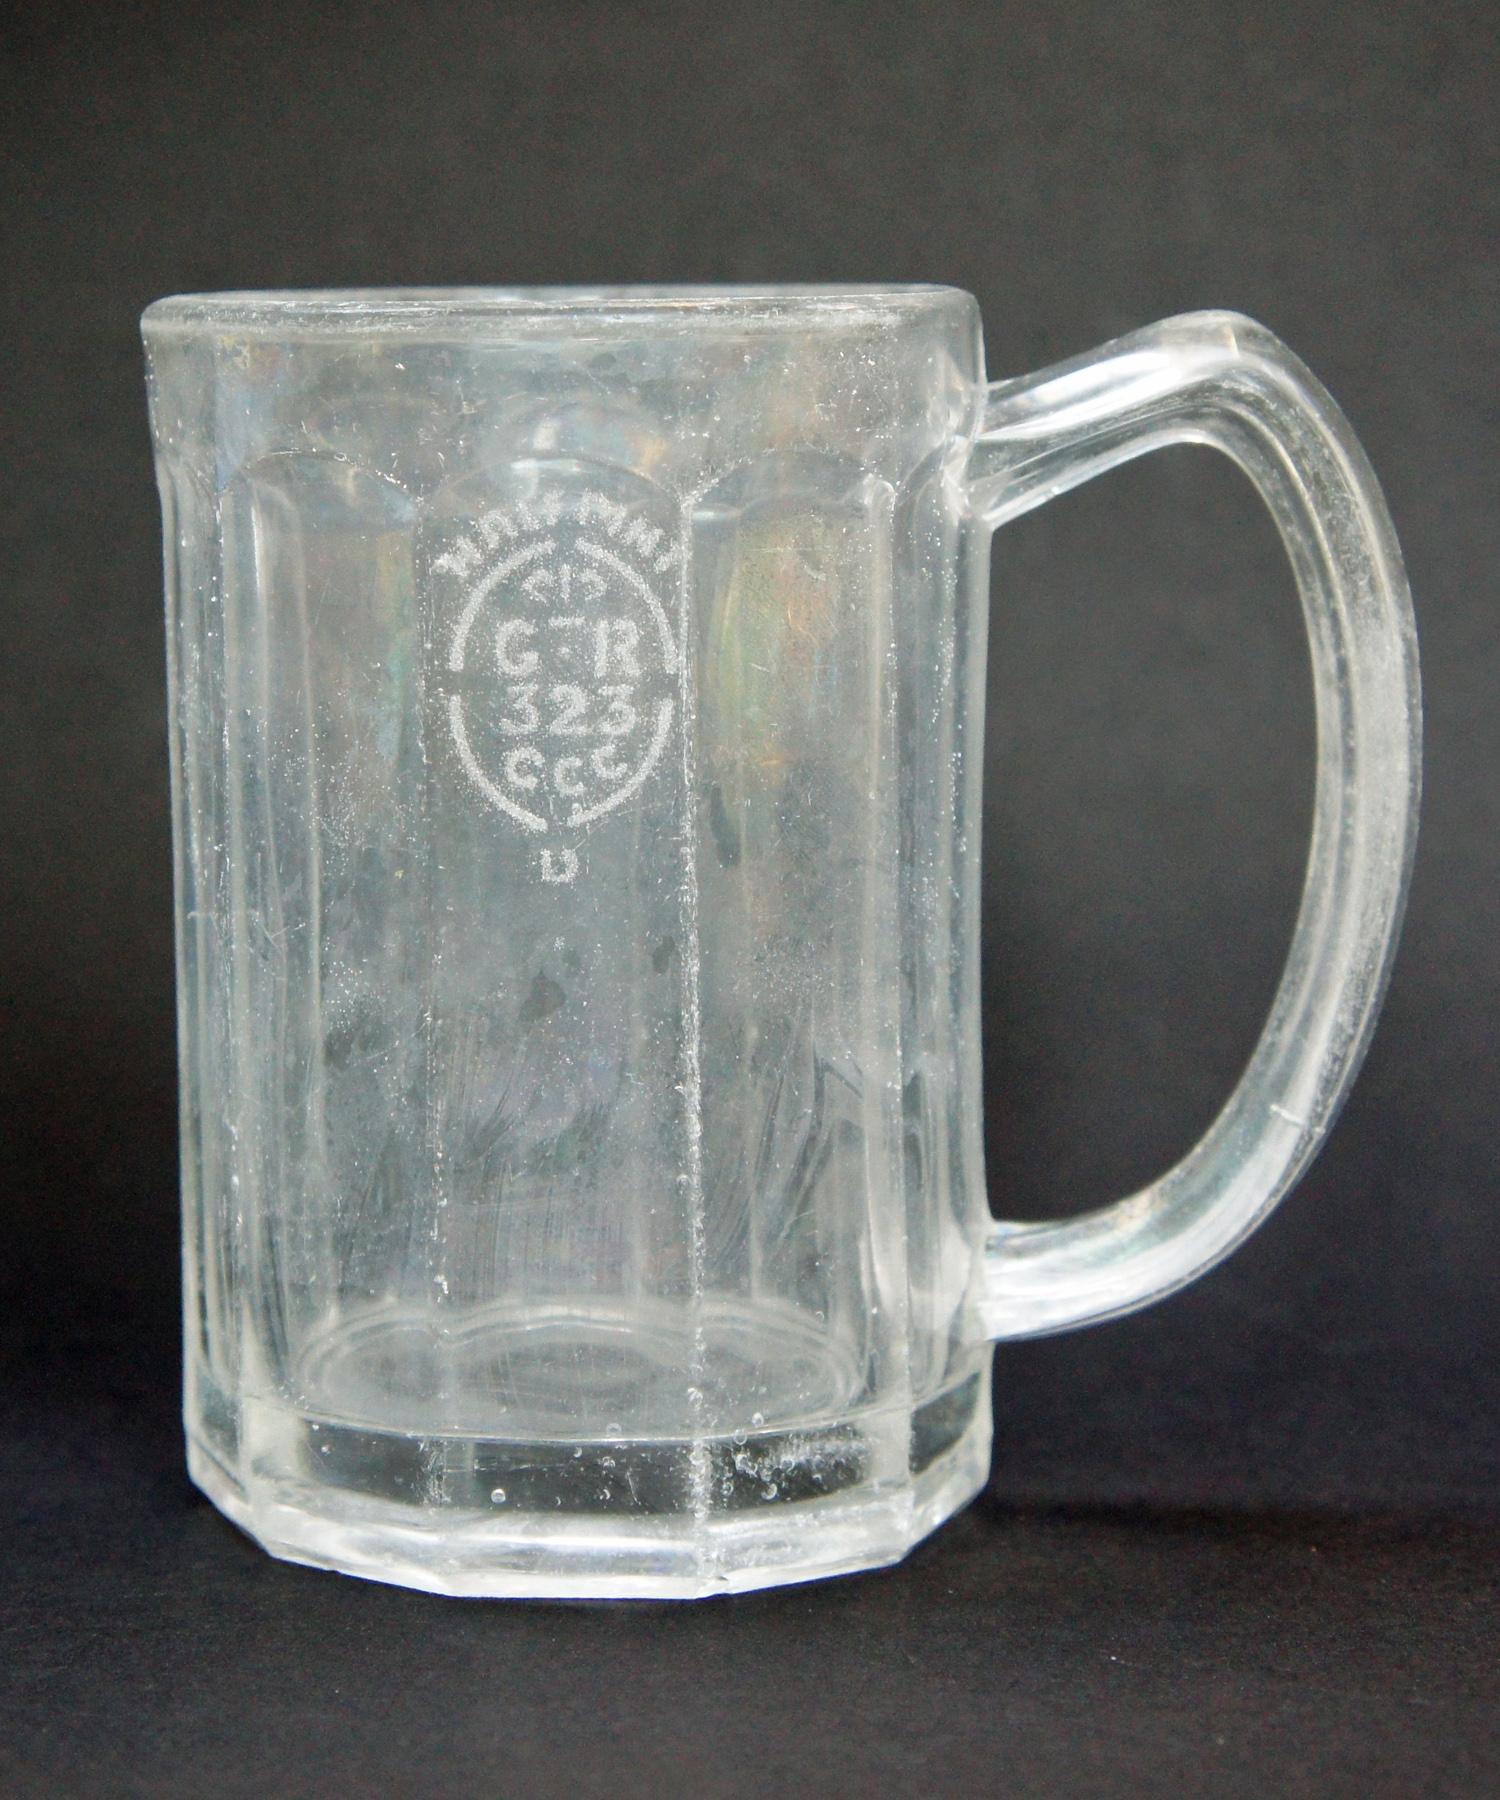 3543f4d9e9e ... Slightly glass-sick 10-sided half-pint glass stamped  GR 323